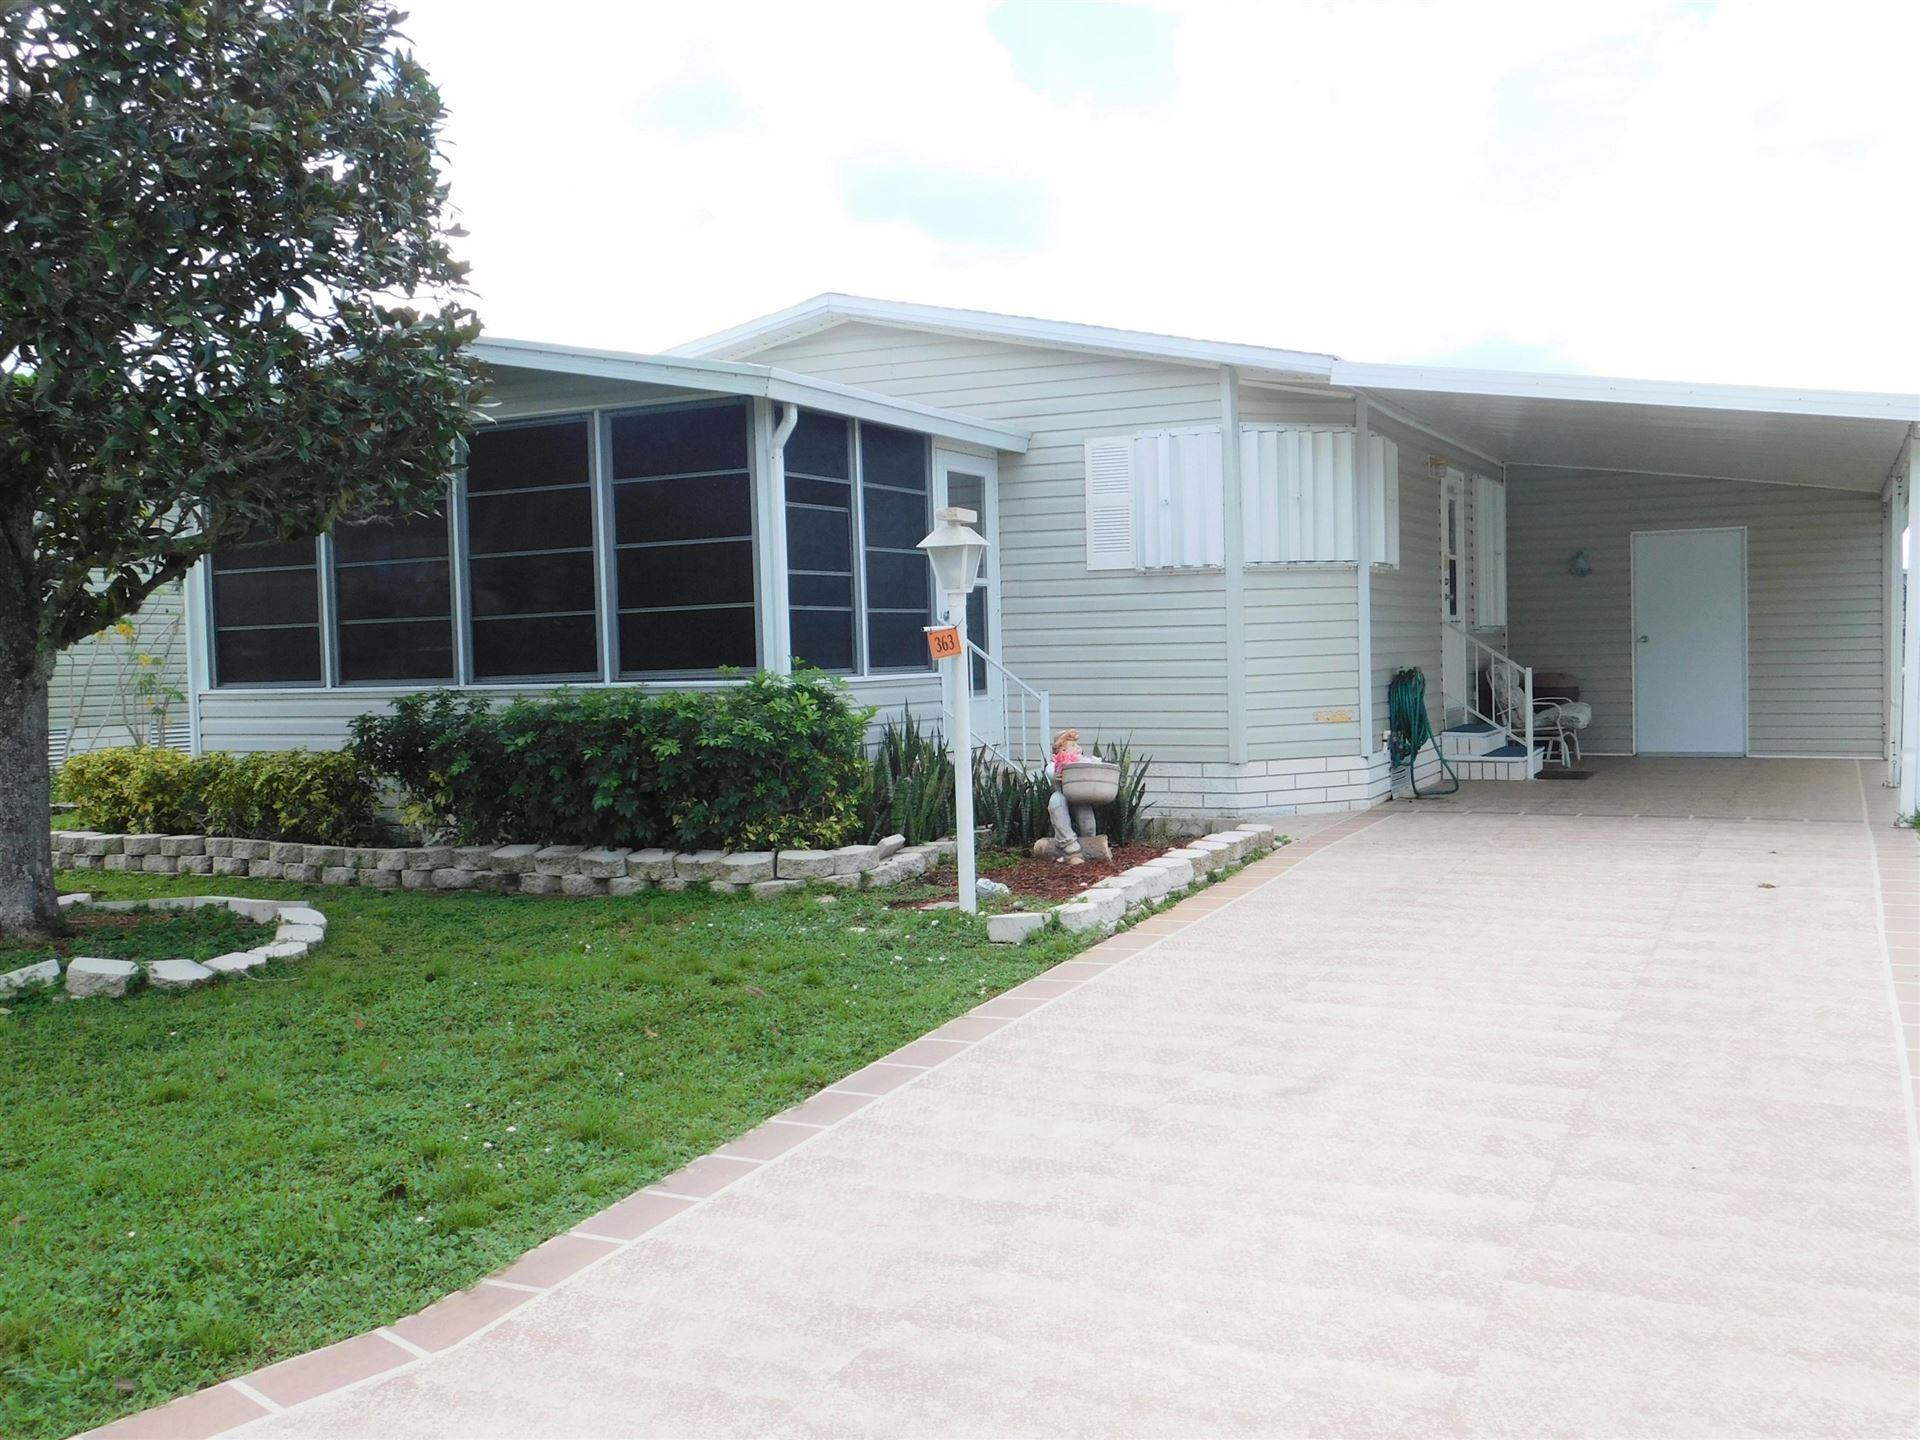 363 Tropical Isles Circle, Fort Pierce, FL 34982 - #: RX-10662896